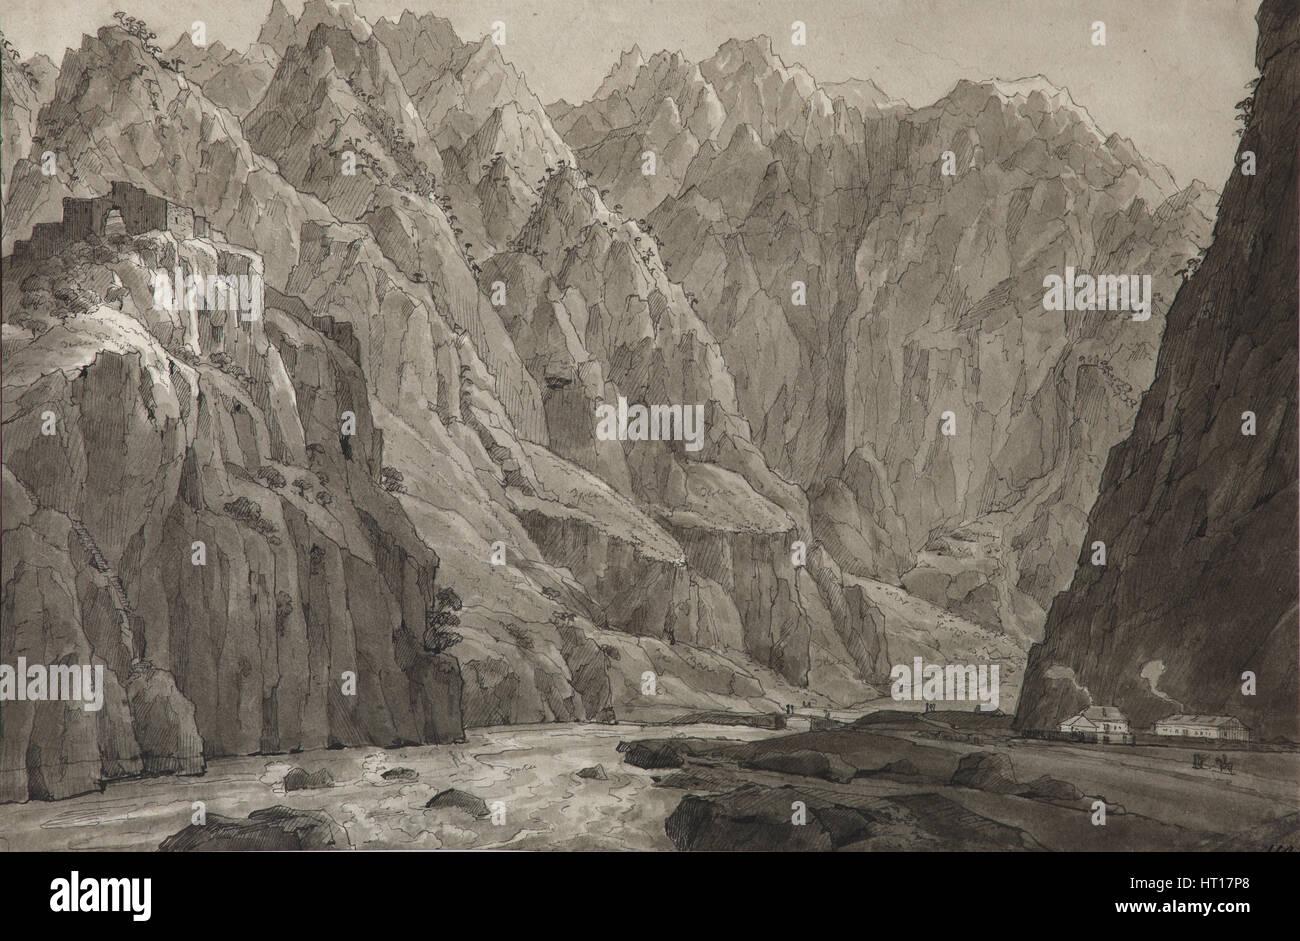 The Darial Gorge, 1830. Artist: Chernetsov, Nikanor Grigoryevich (1805-1879) - Stock Image